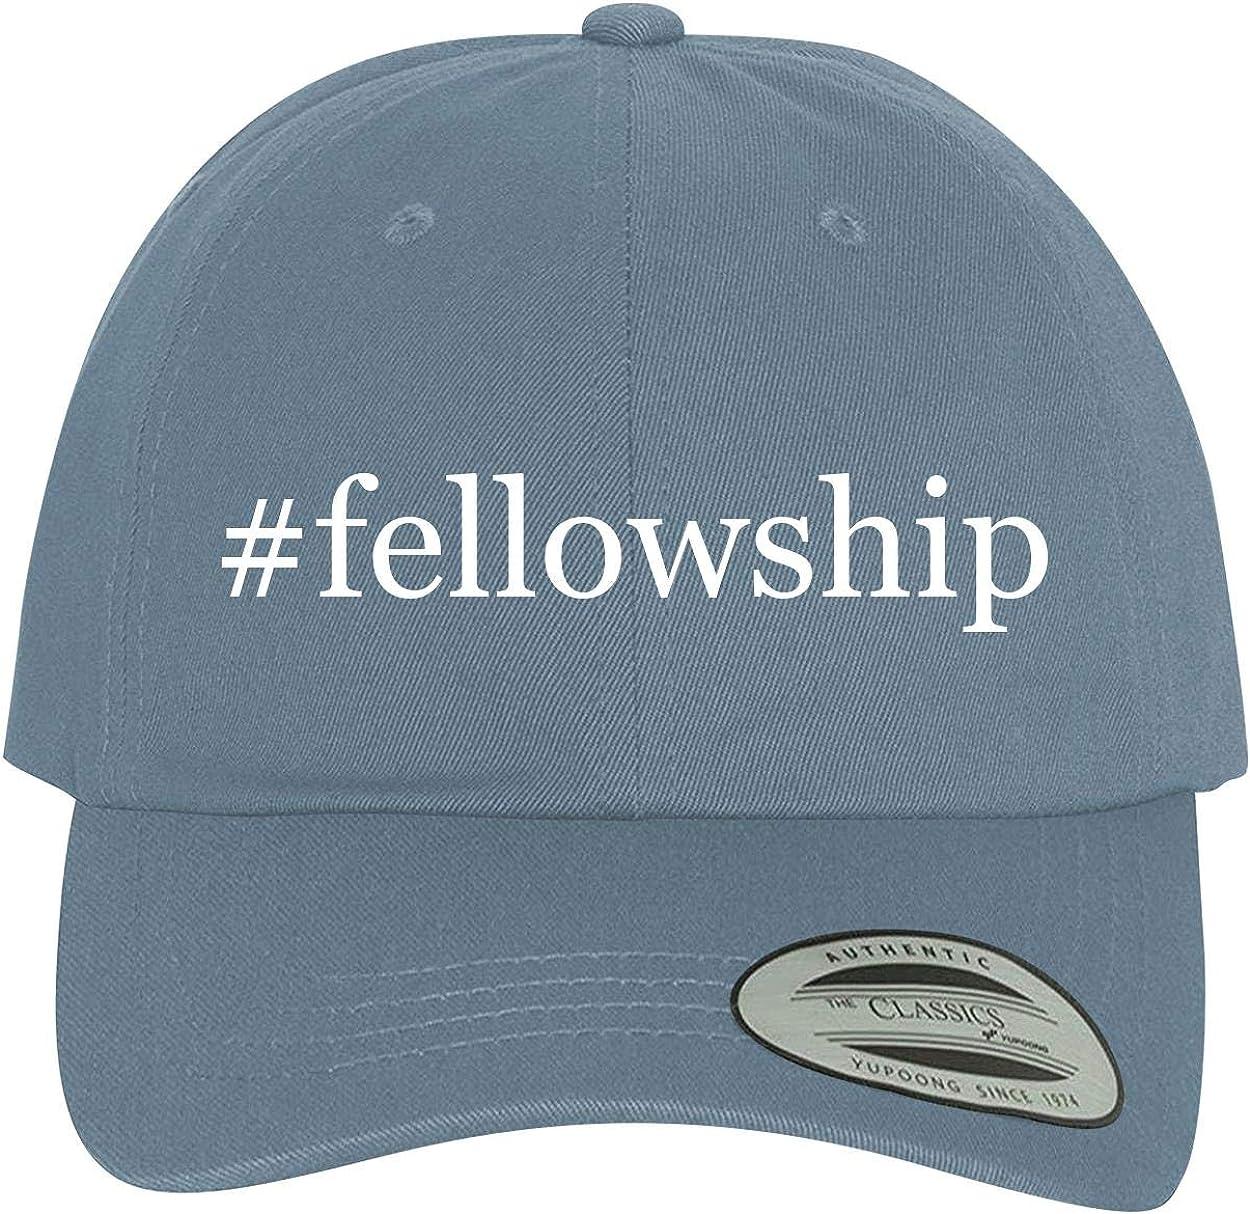 Comfortable Dad Hat Baseball Cap BH Cool Designs #Fellowship